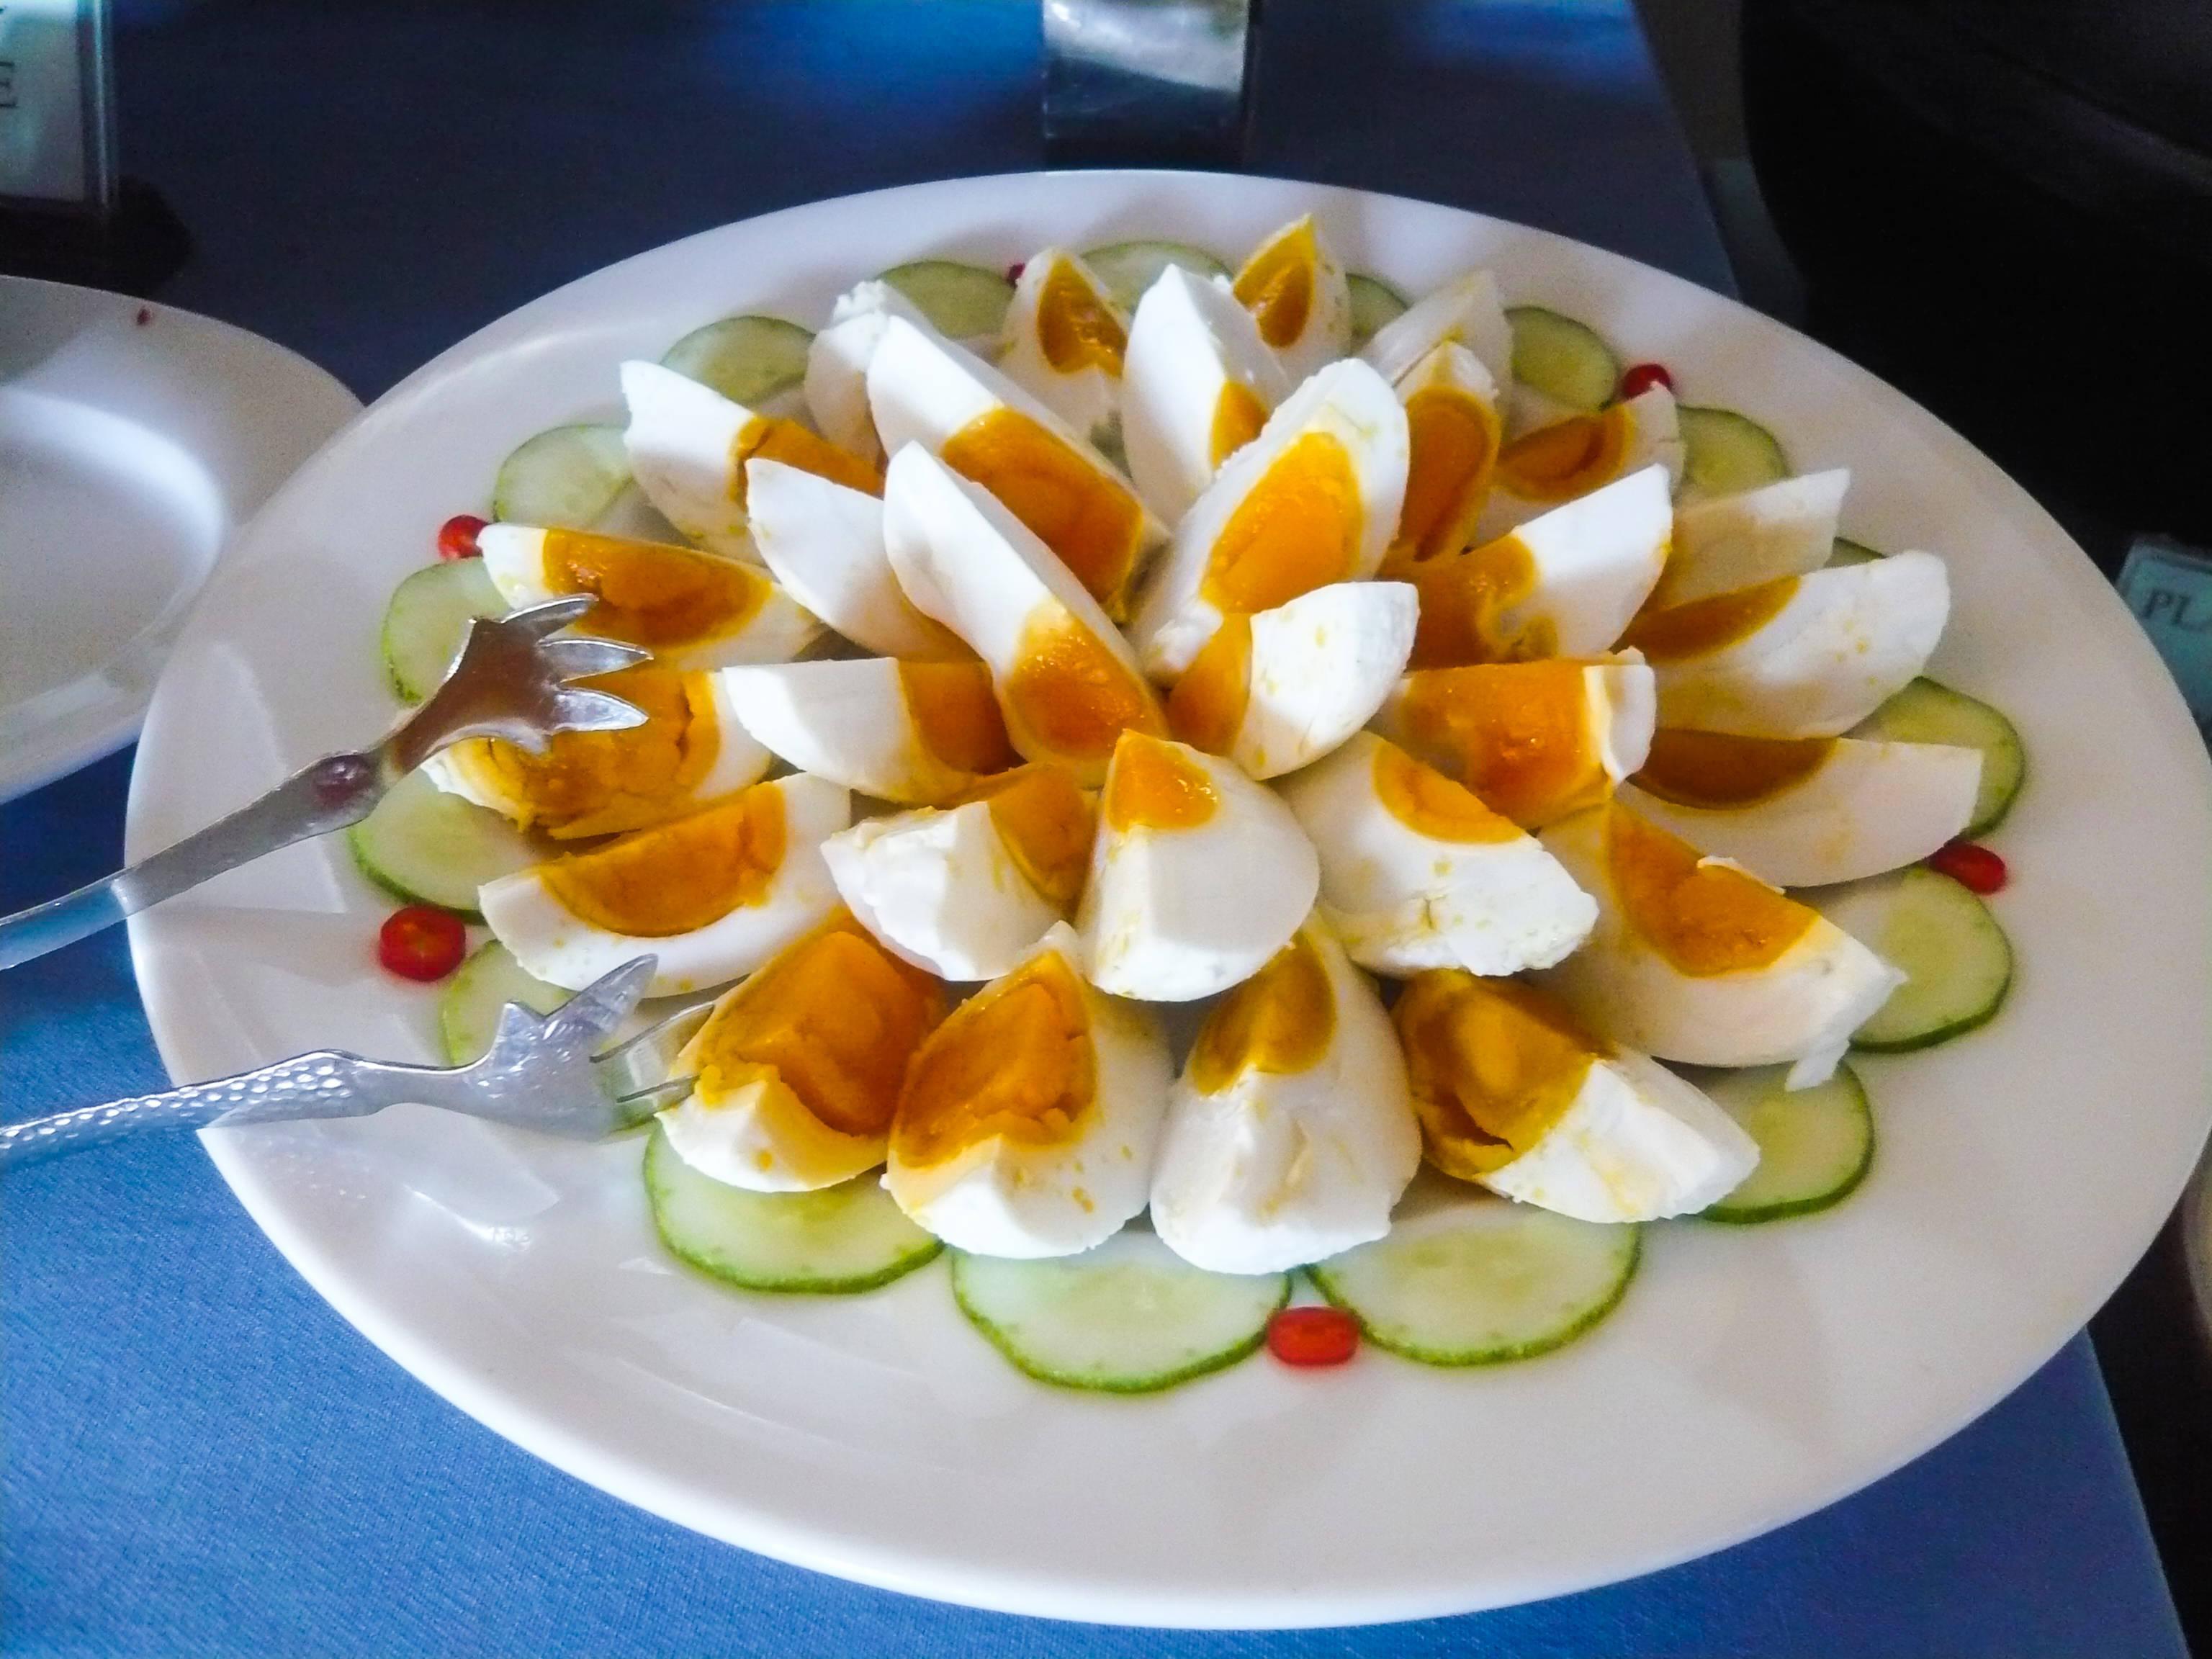 Cháo trứng vịt muối ( Porridge with salted duck eggs)